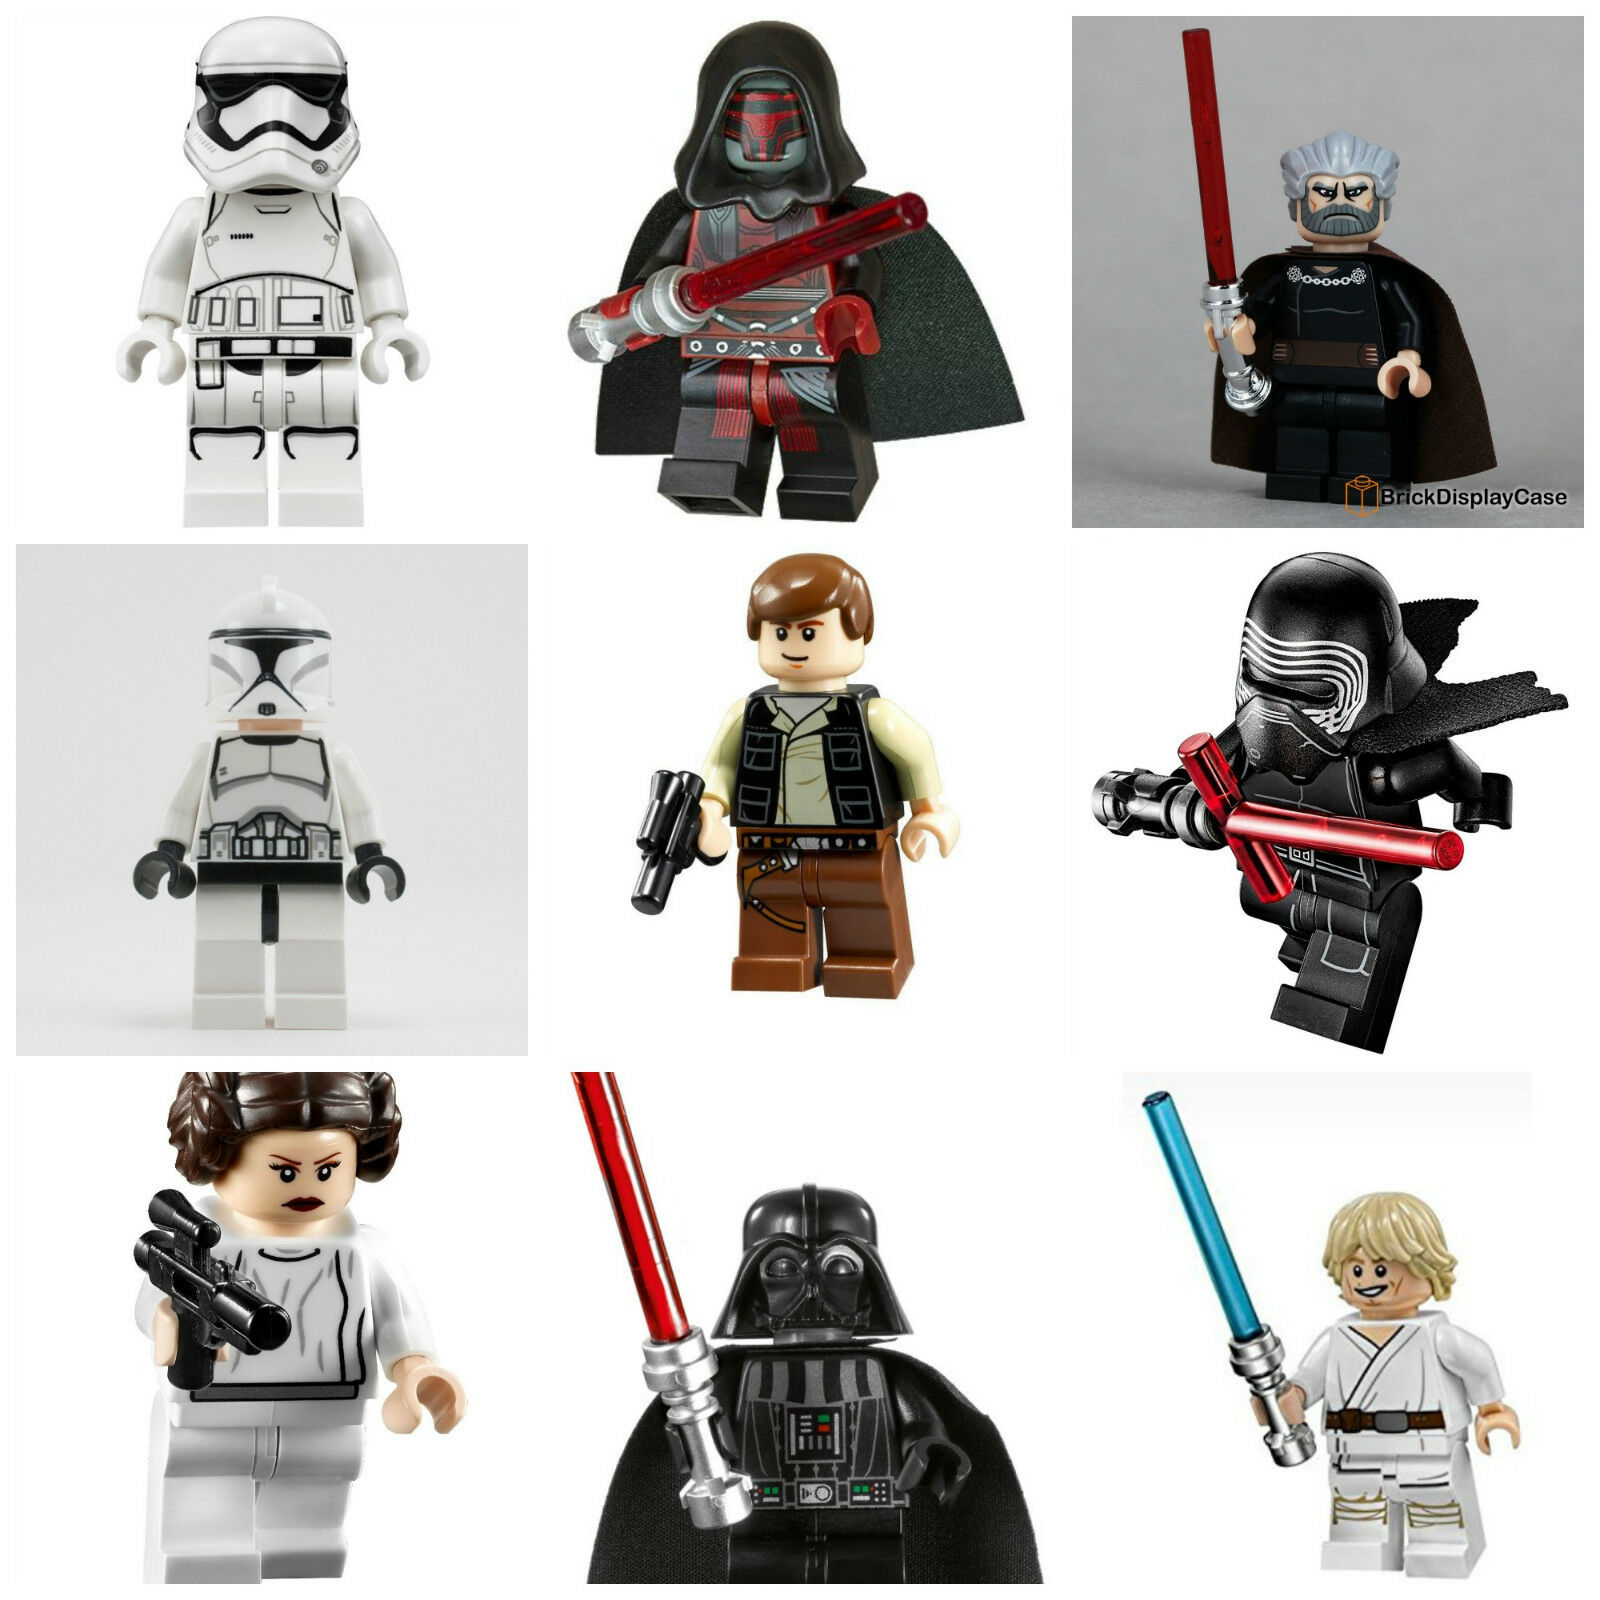 Star Wars Last Jedi Lego Darth Vader Kylo Ren Han Solo Mini Figures 60+ Designs